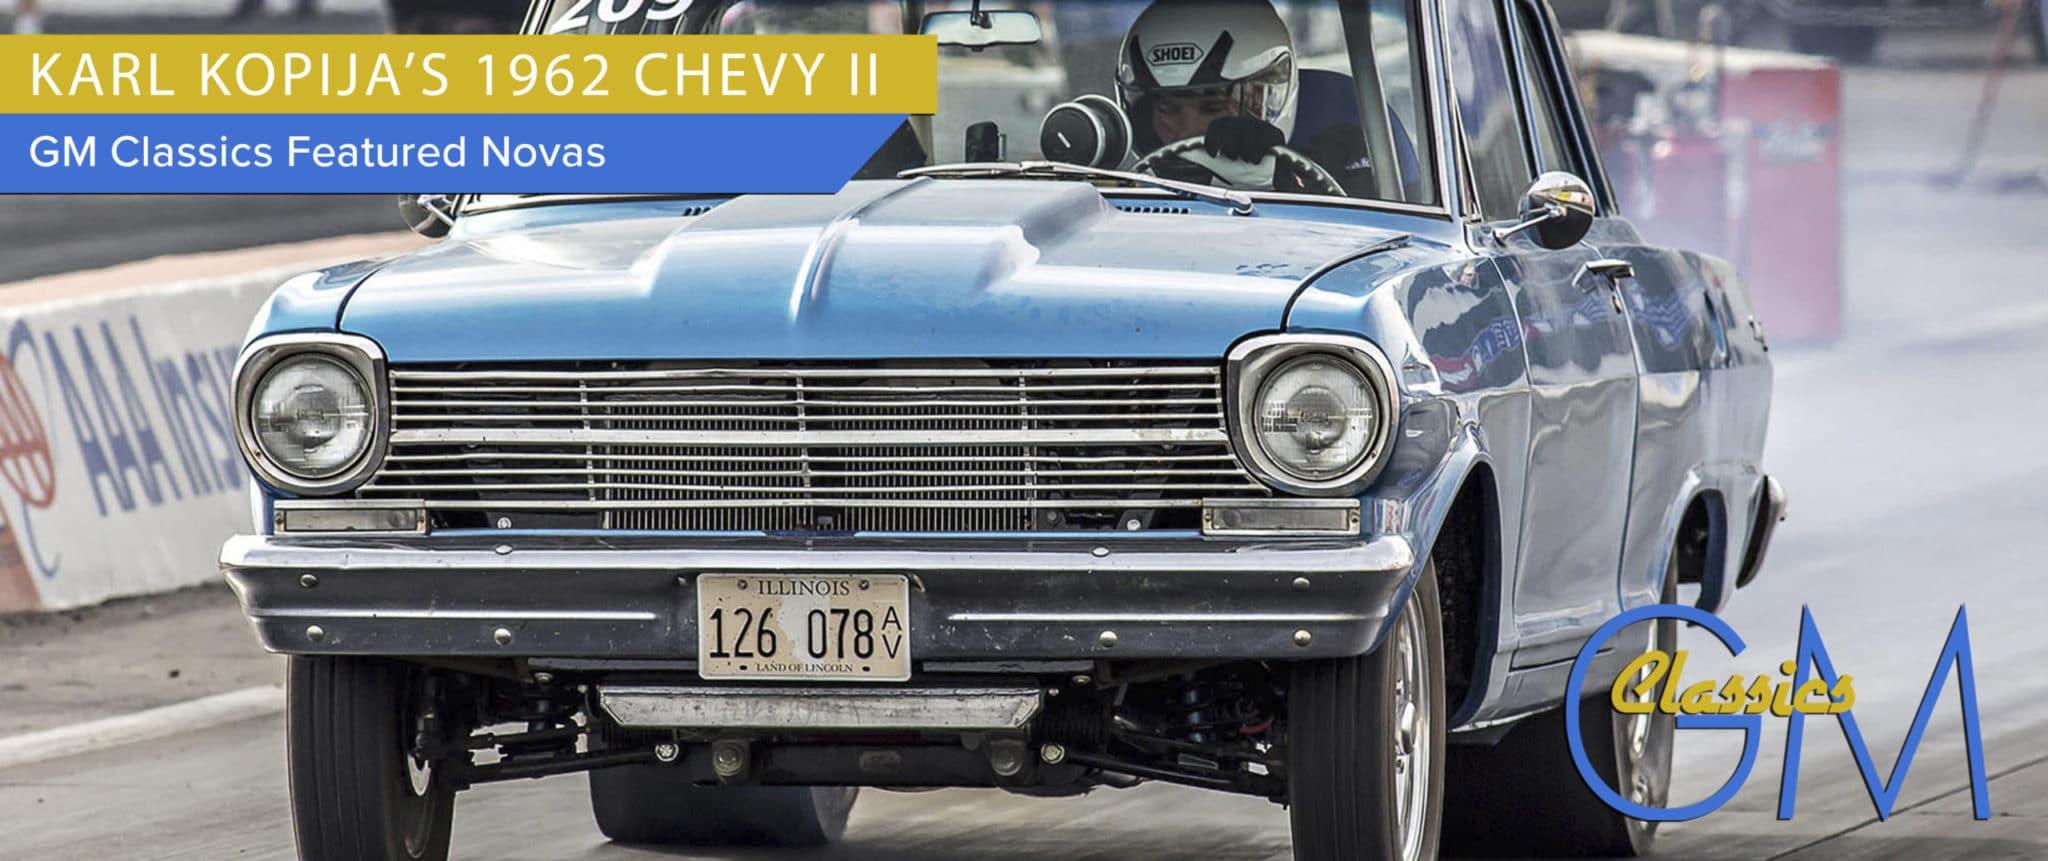 Karl Kopija's 1962 Chevy II